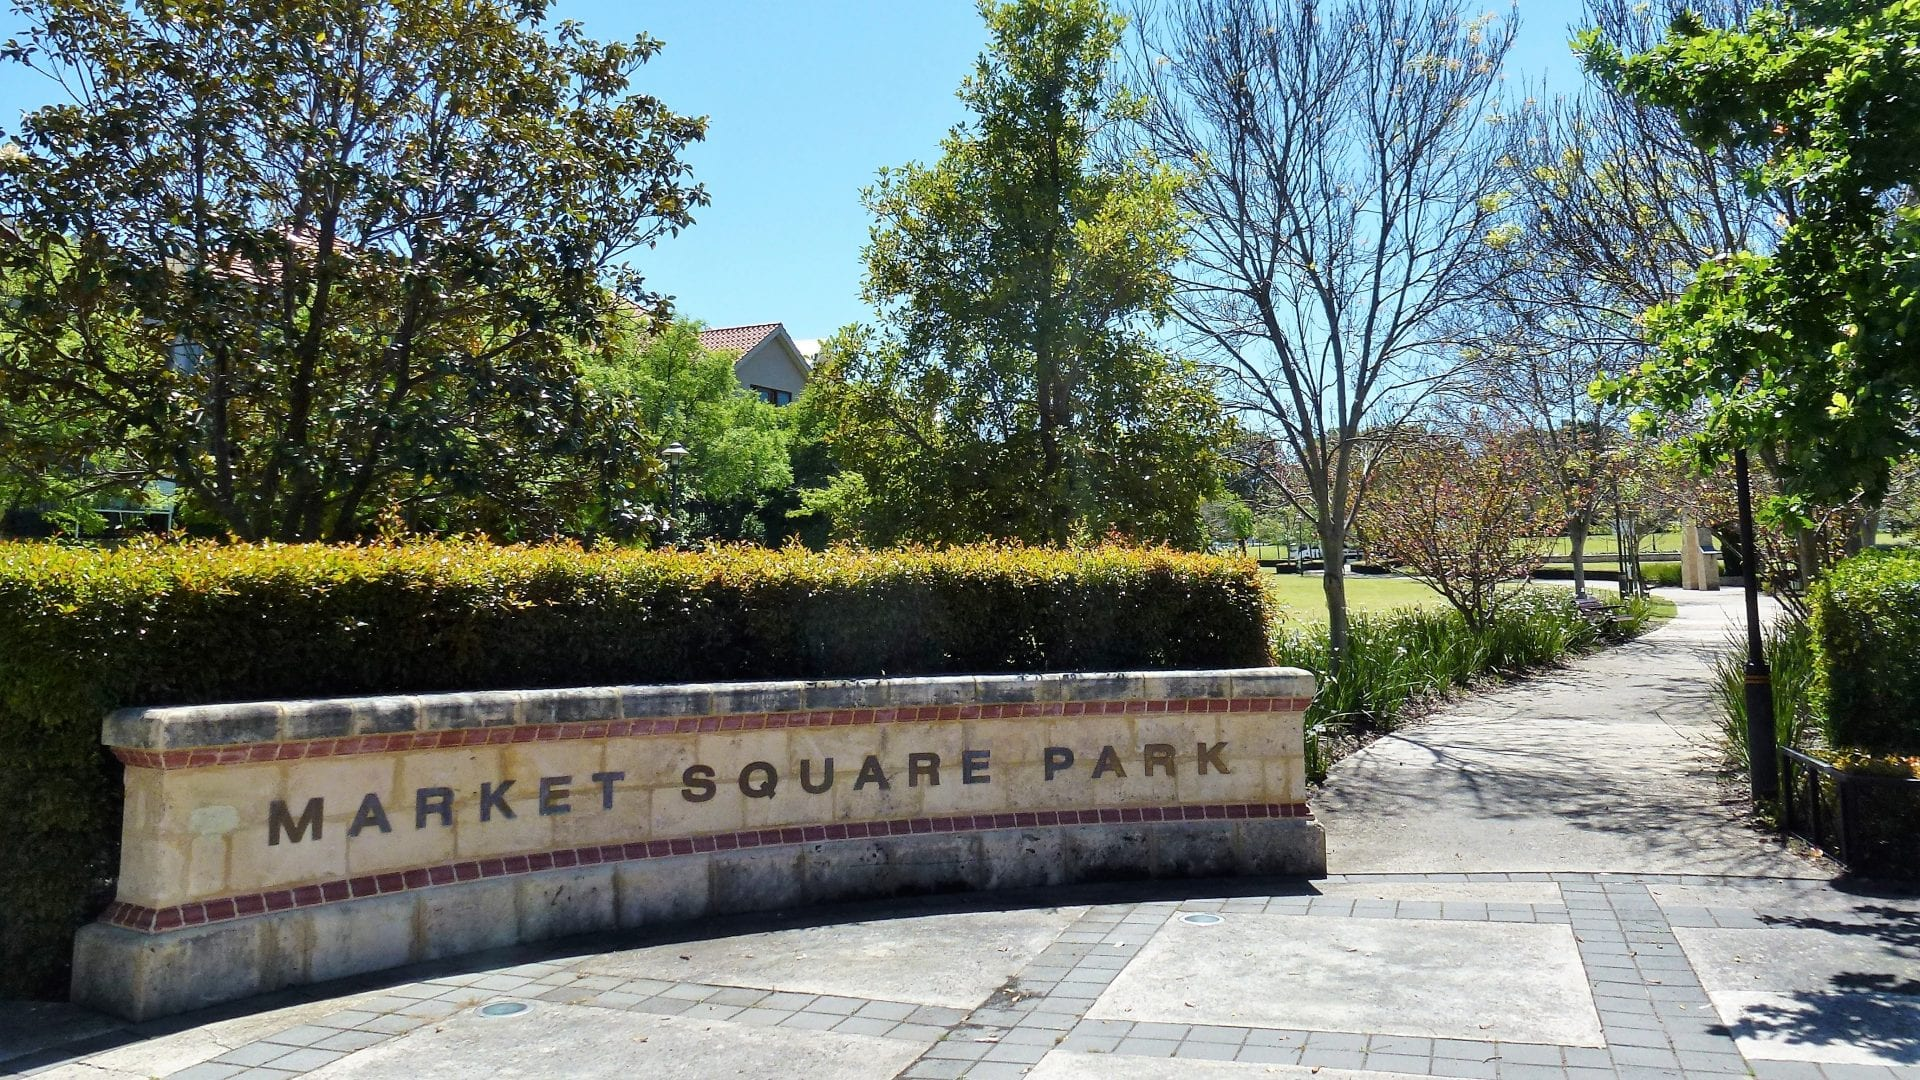 subi-Market-Square-Park-1-1920x1080